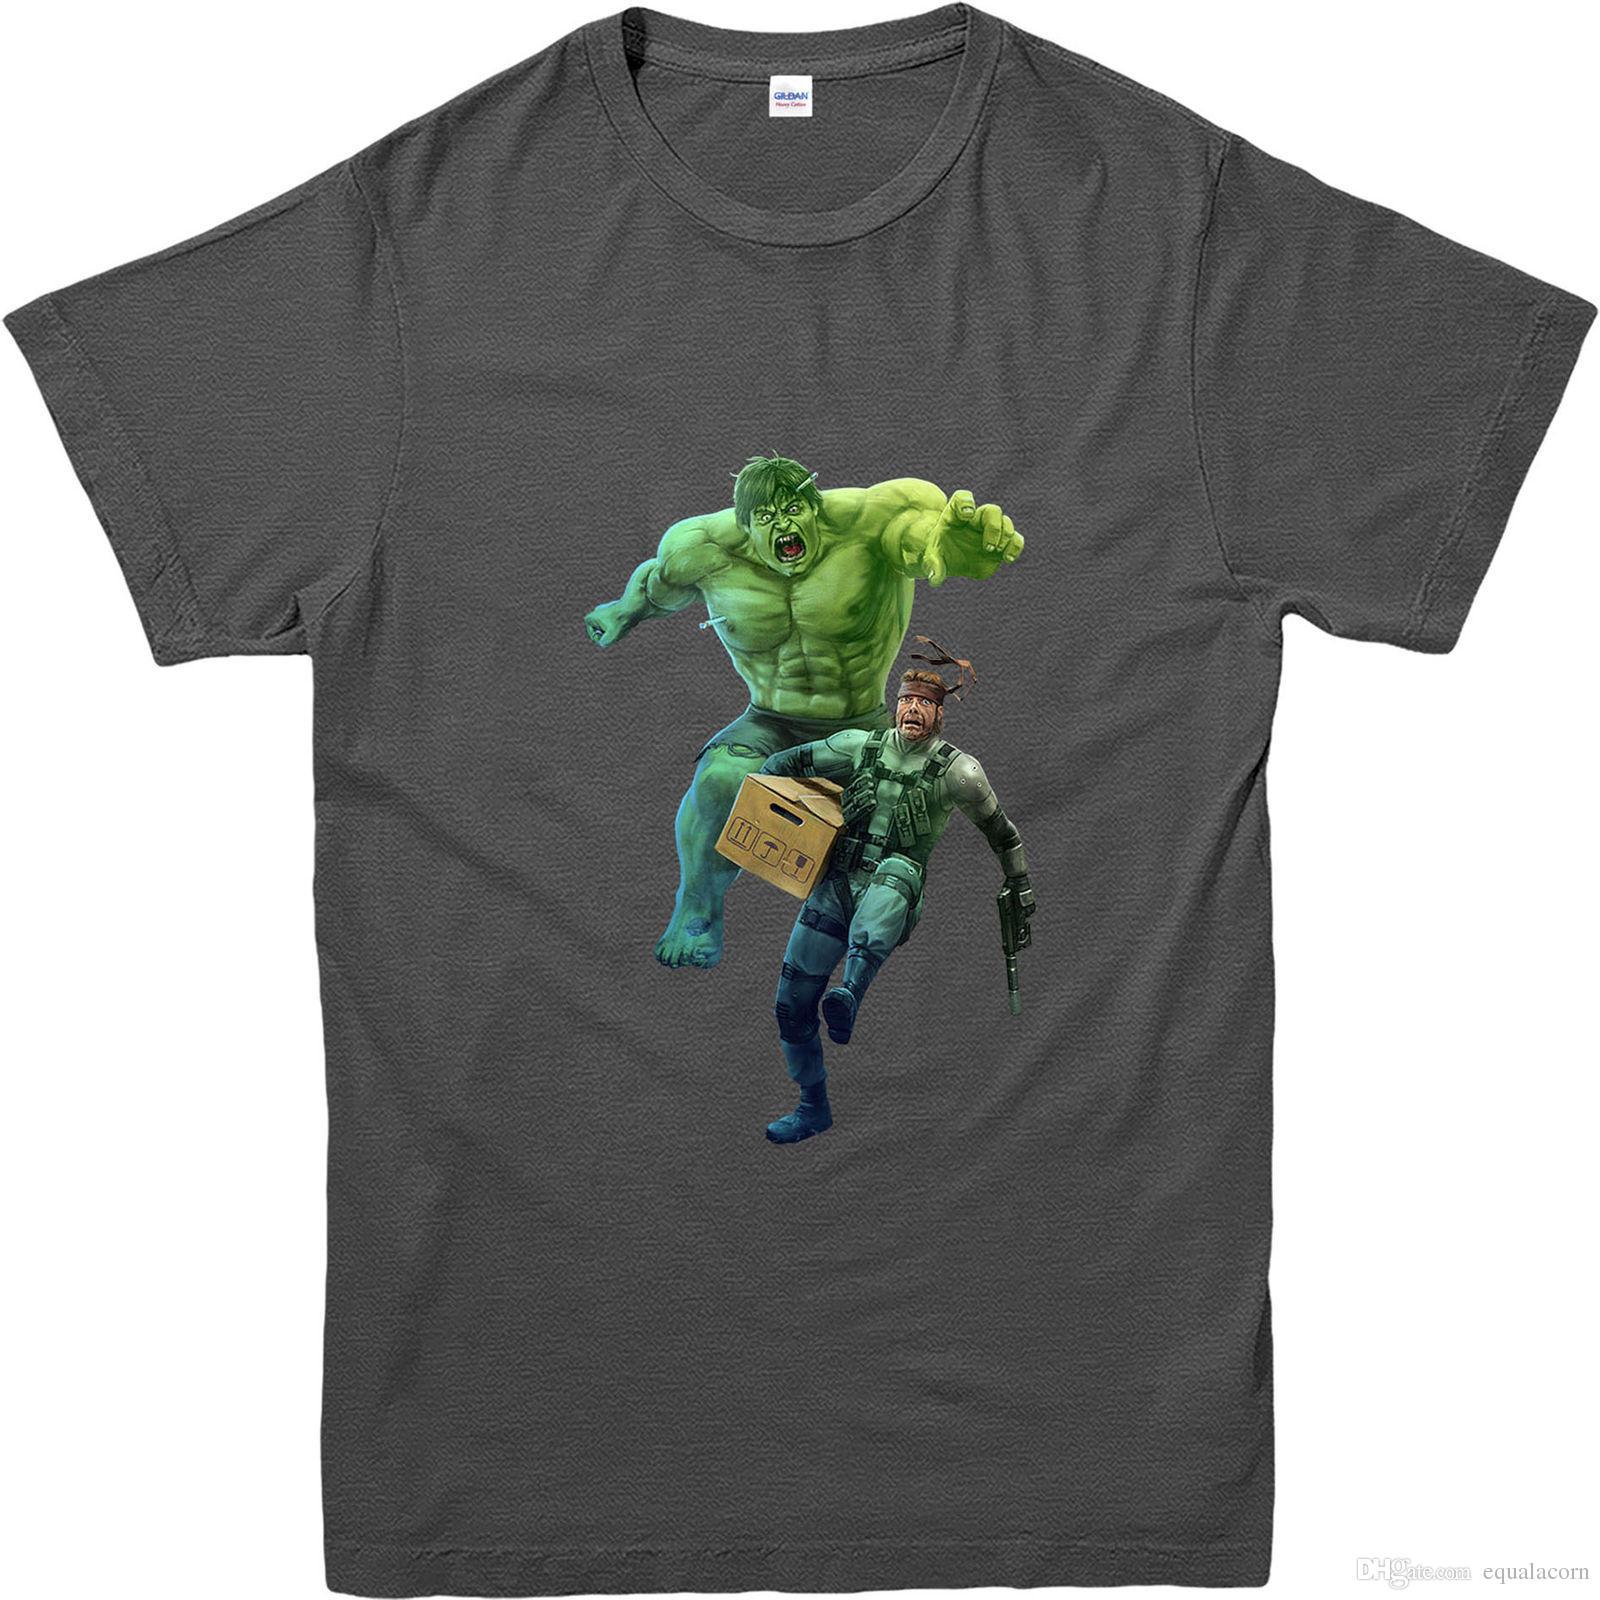 e8b025b21982 Tyson Fury Vs Deontay Wilder T Shirt Gyspy King Boxing MMA UFC Unisex Tee  Top One Day T Shirts Coolest T Shirt From Equalacorn, $10.3| DHgate.Com